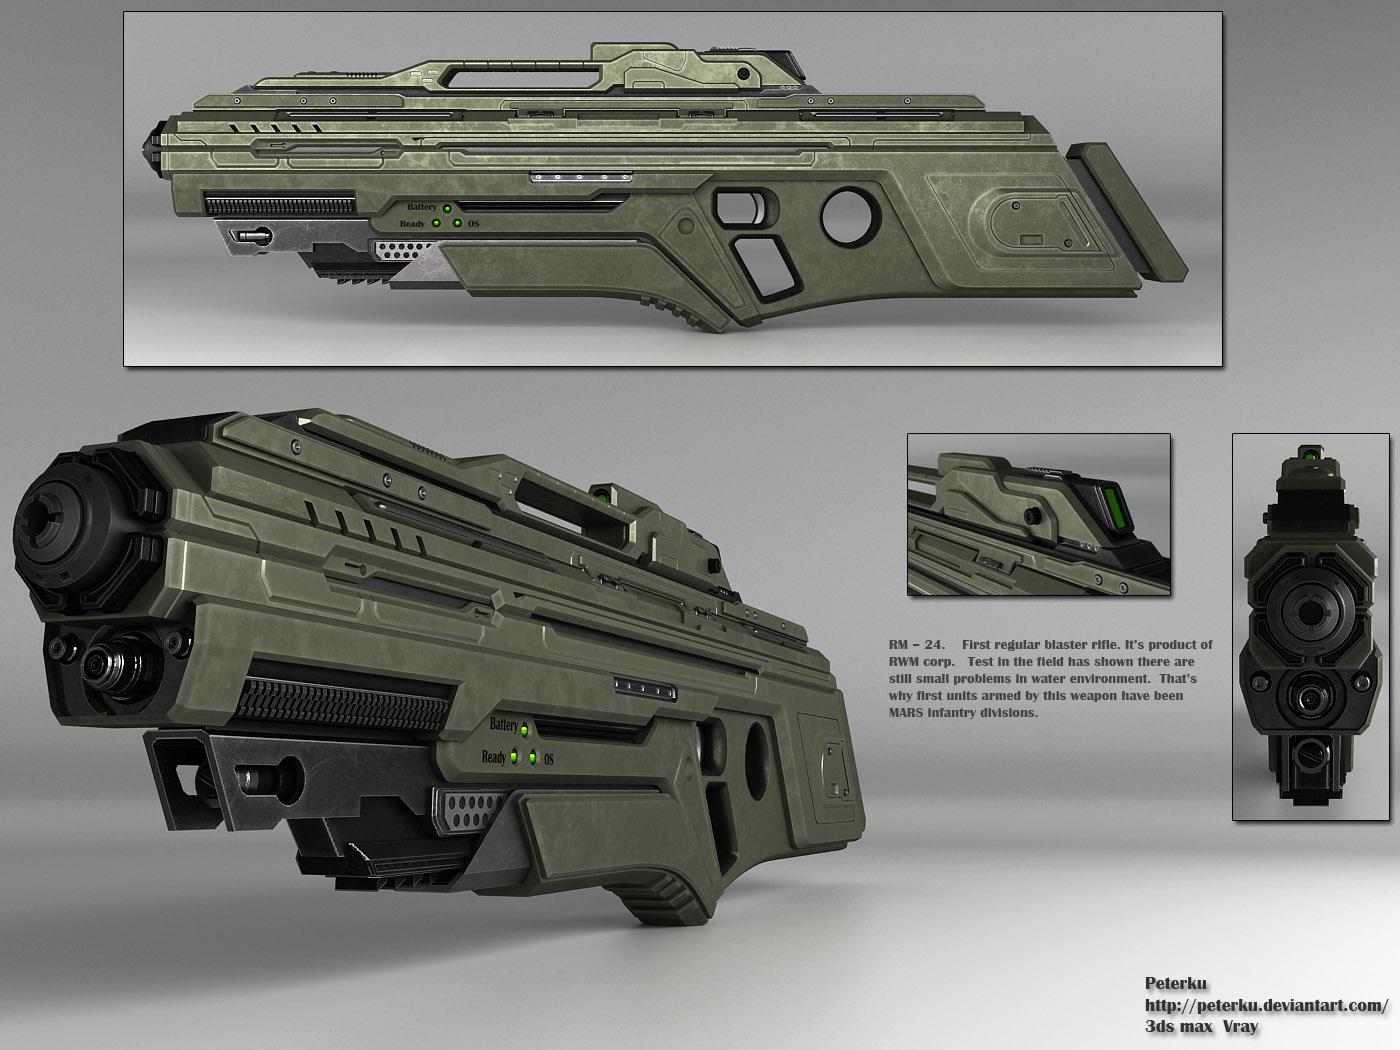 Blaster rifle by peterku